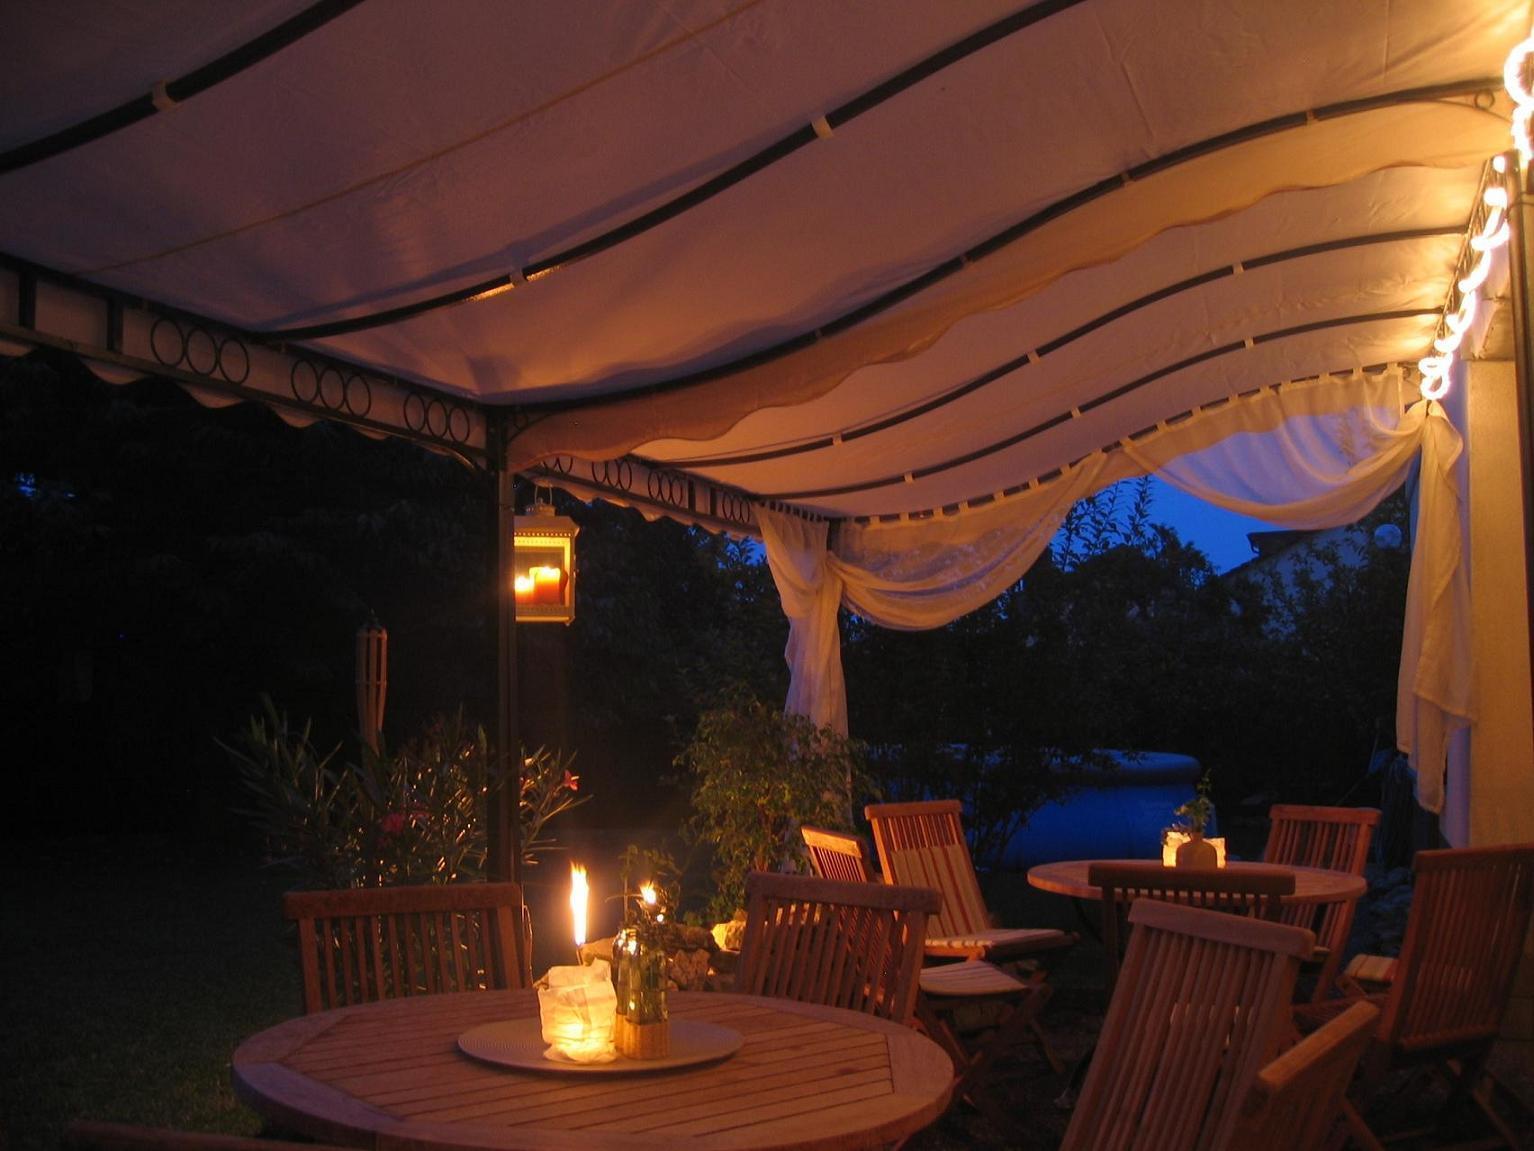 terrassen berdachung pergola feststehende markise terrassenpavillon 3m x 2 5m eur 549 00. Black Bedroom Furniture Sets. Home Design Ideas